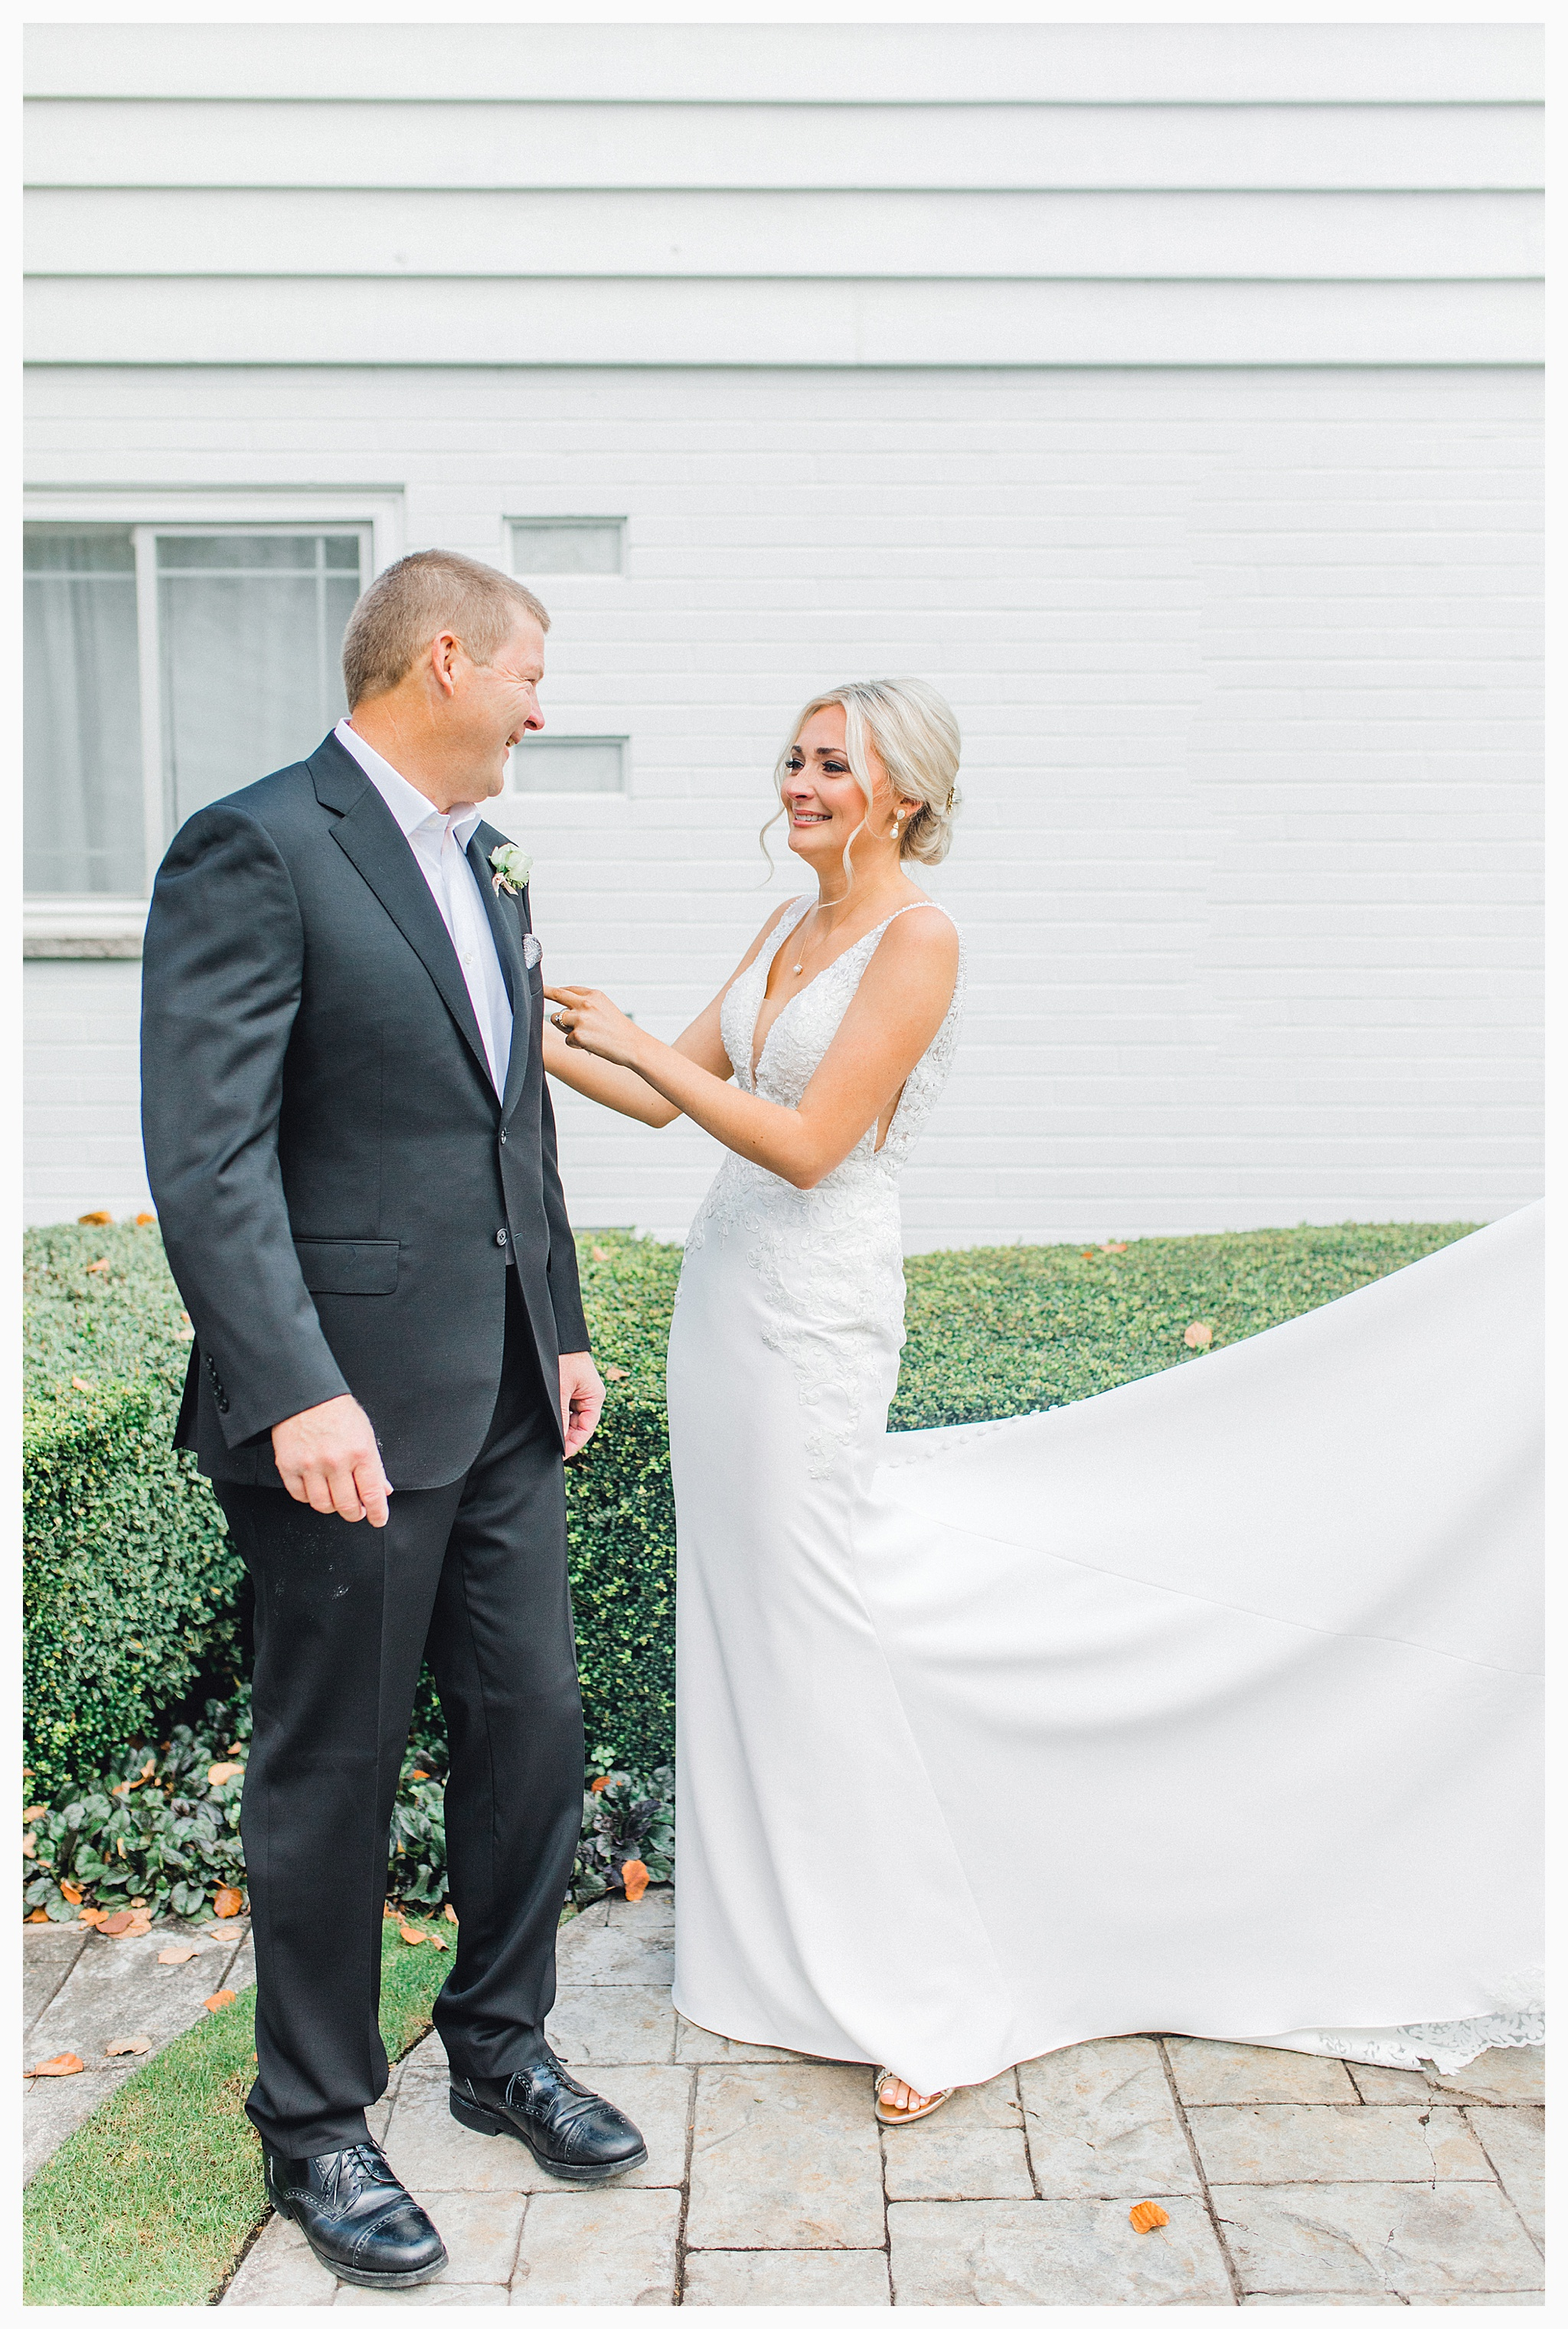 Emma Rose Company Light and Airy Wedding Photographer, Beautiful fall wedding at Rock Creek Gardens Venue in Puyallup, Washington._0019.jpg